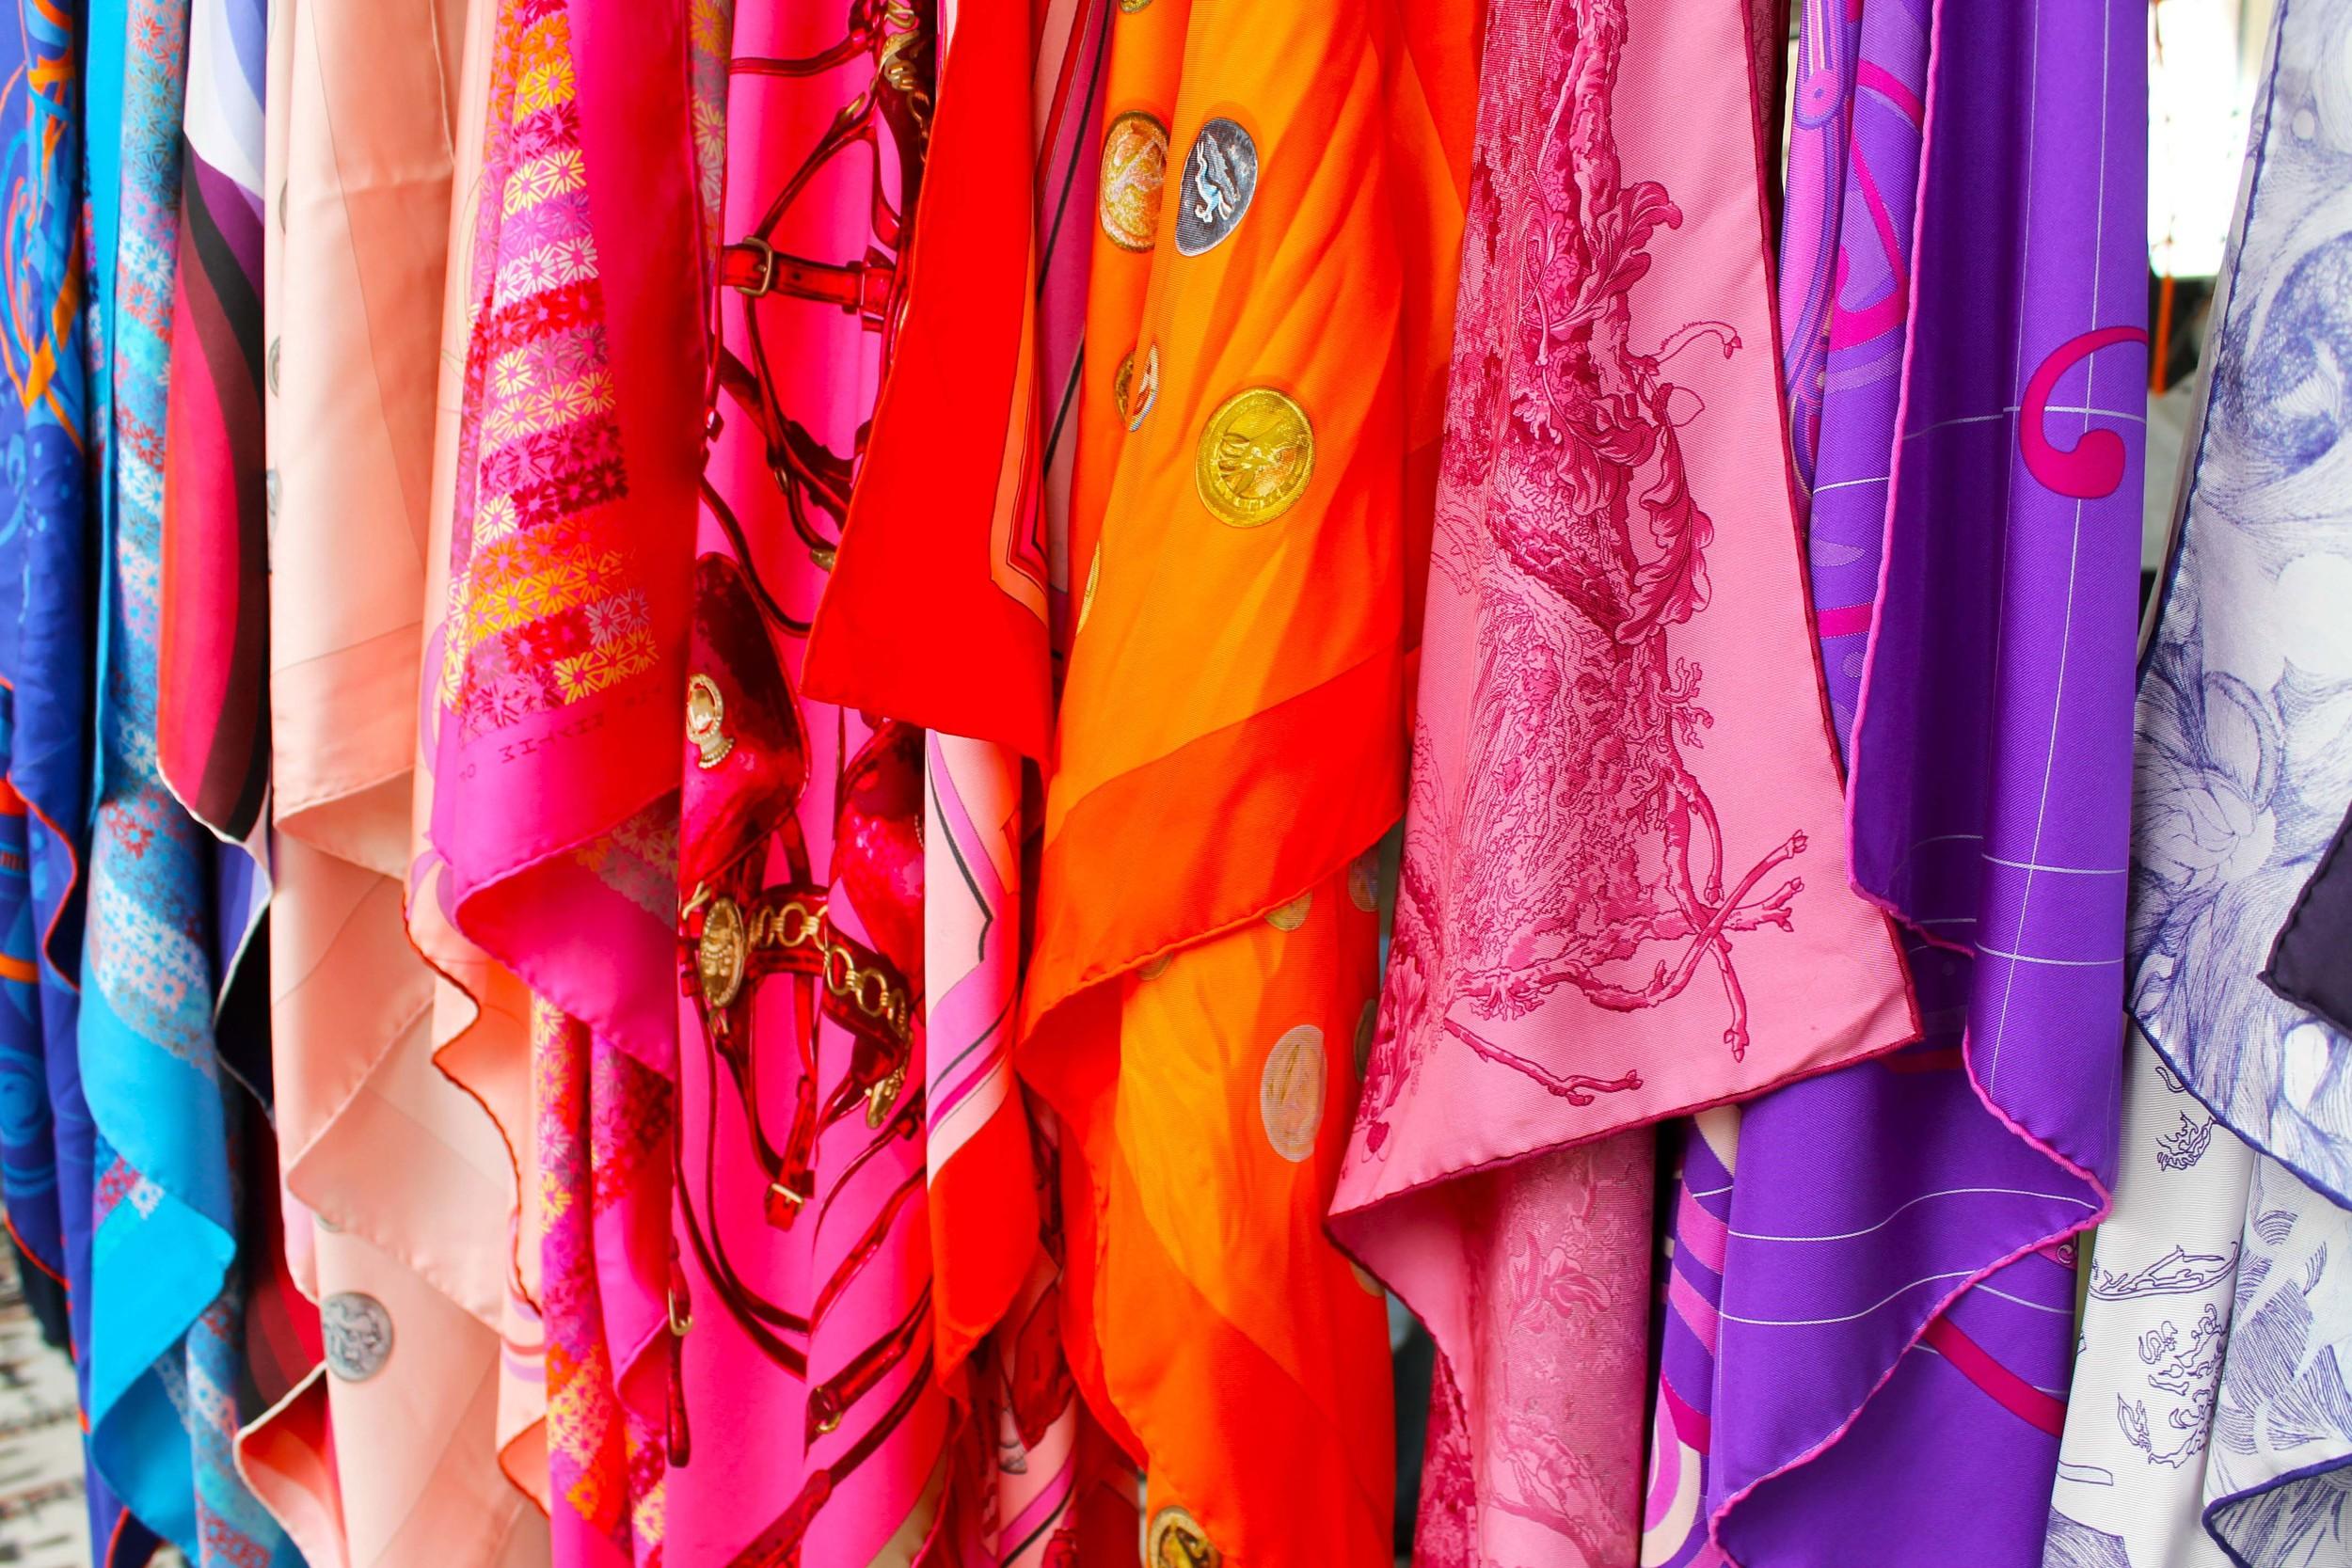 Such vibrant colors!